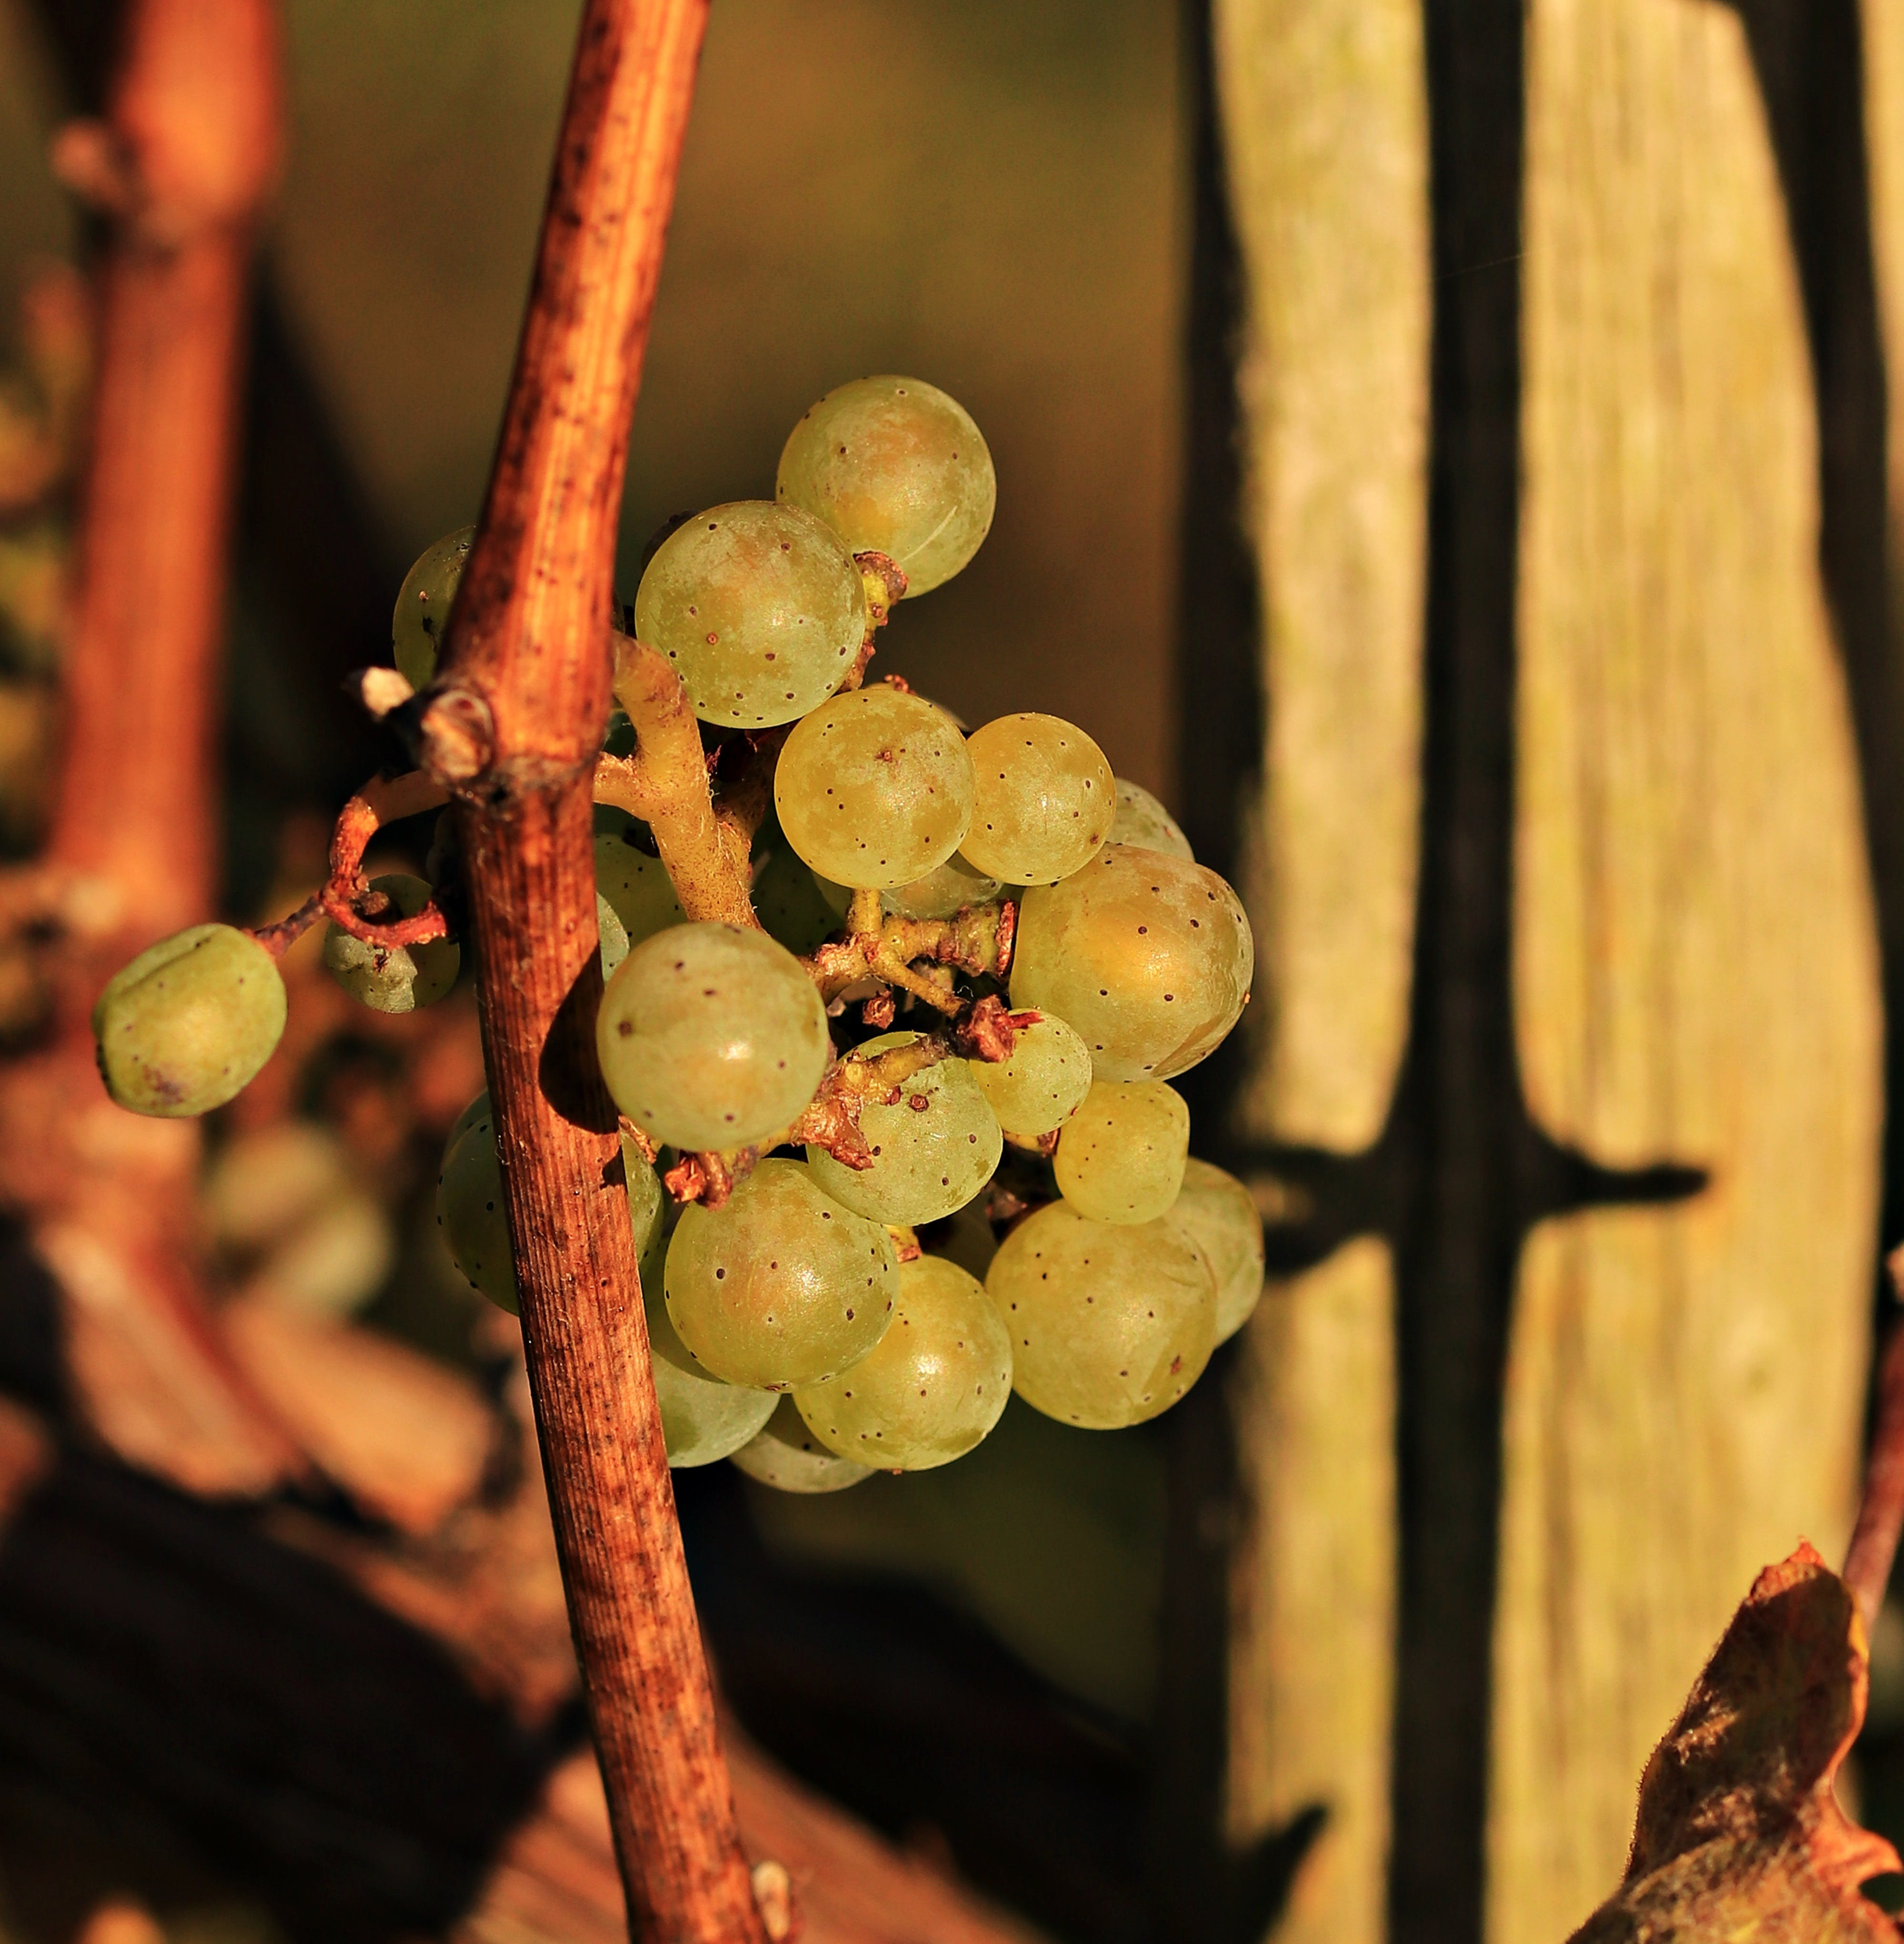 Close Photo of Grapes